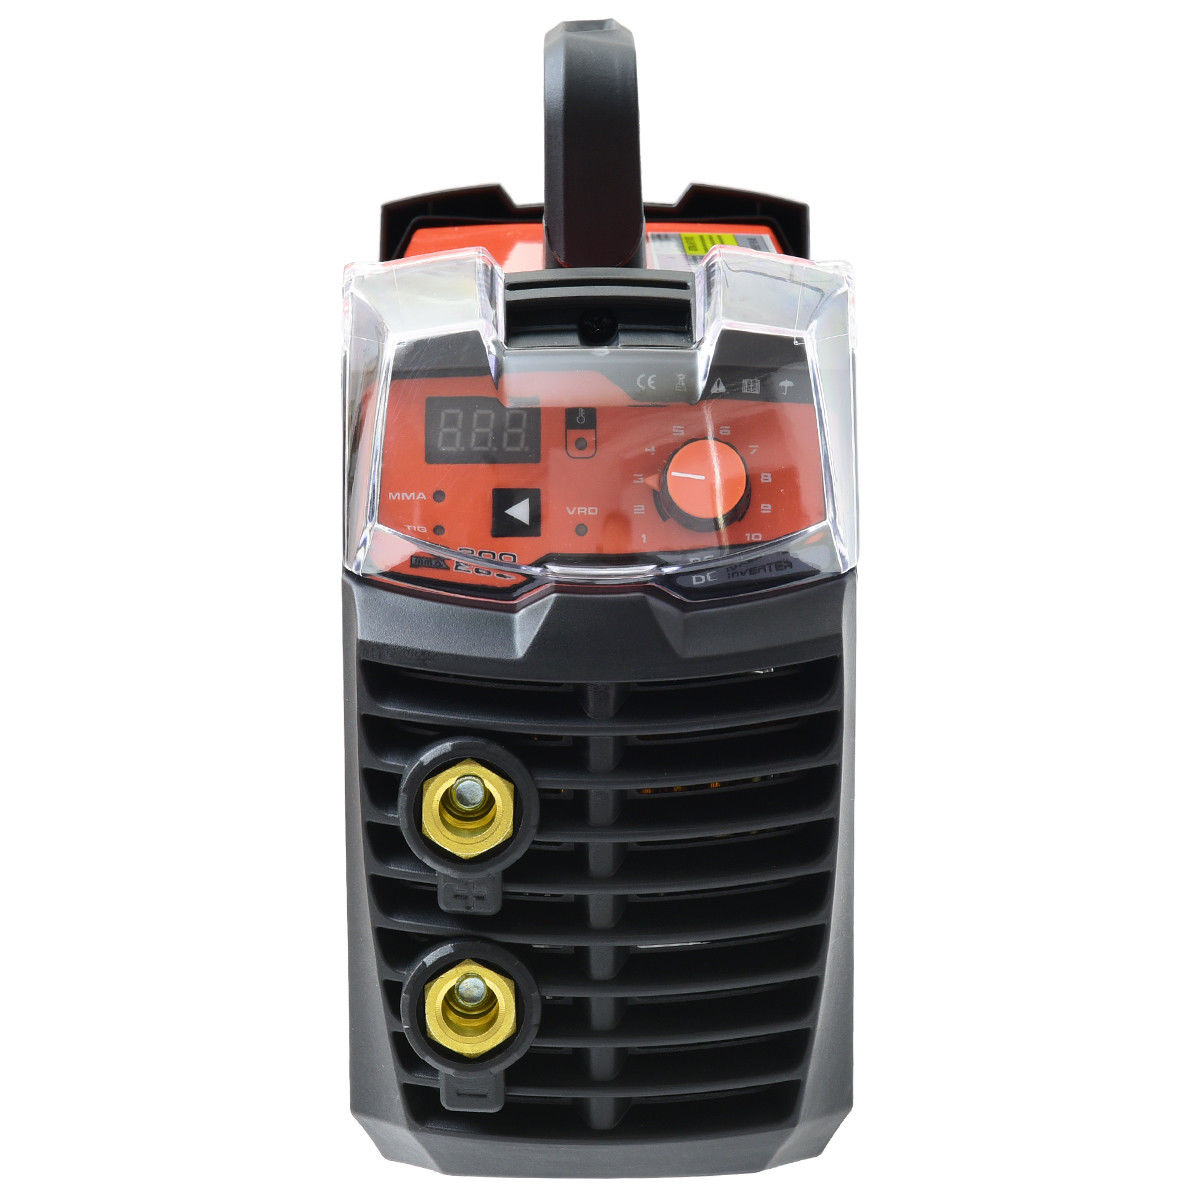 Goplus MMA TIG ARC IGBT Welding Machine 200 AMP 110/220V Welder DC Inverter  LED Display - Walmart.com